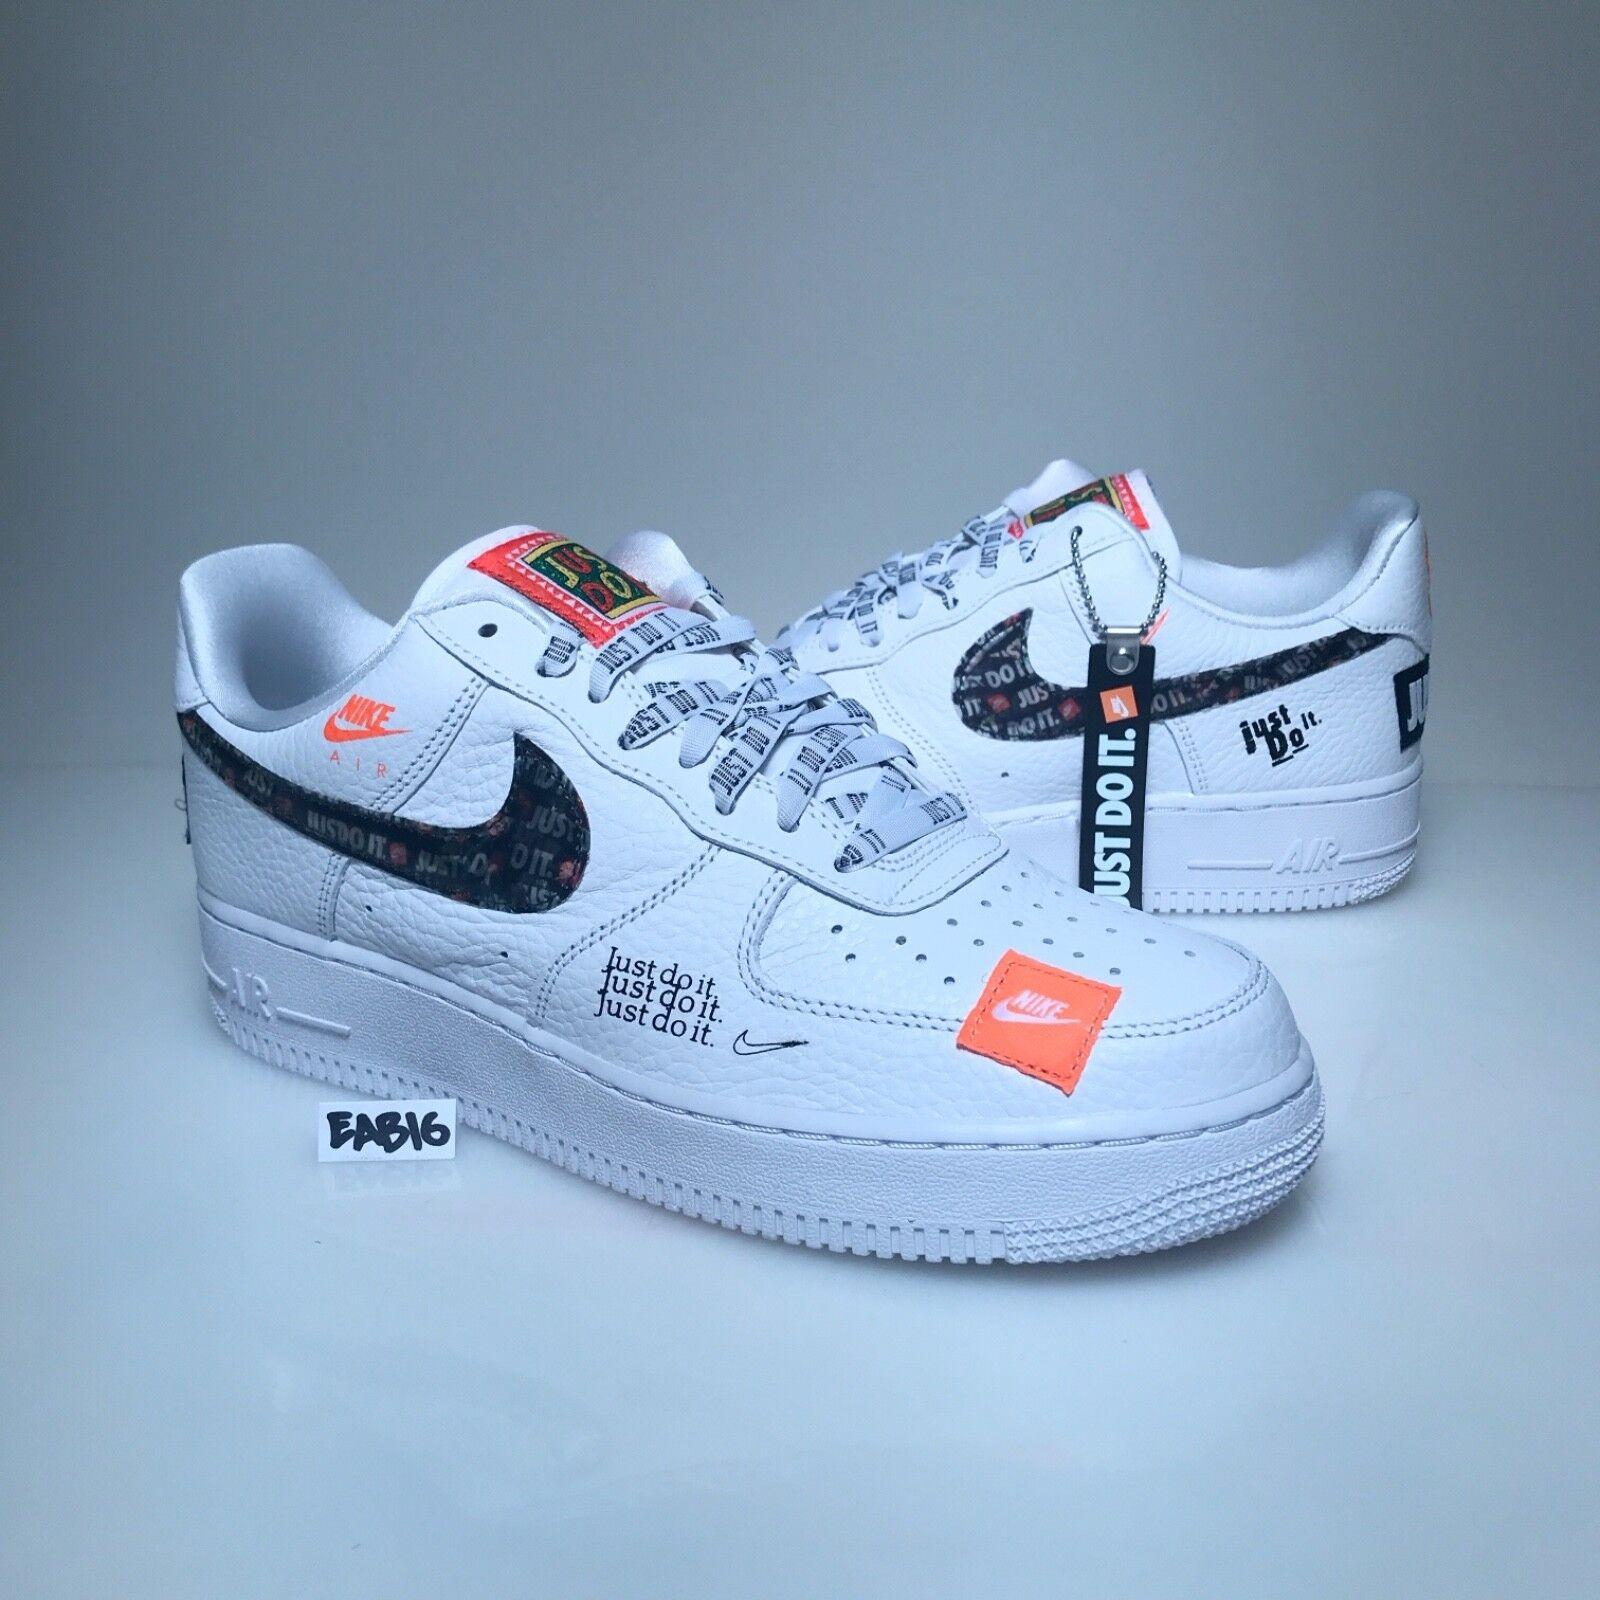 052b27d9 Nike Air Force 1 One Low 07 PRM JDI Just Do It White Black Orange AF1